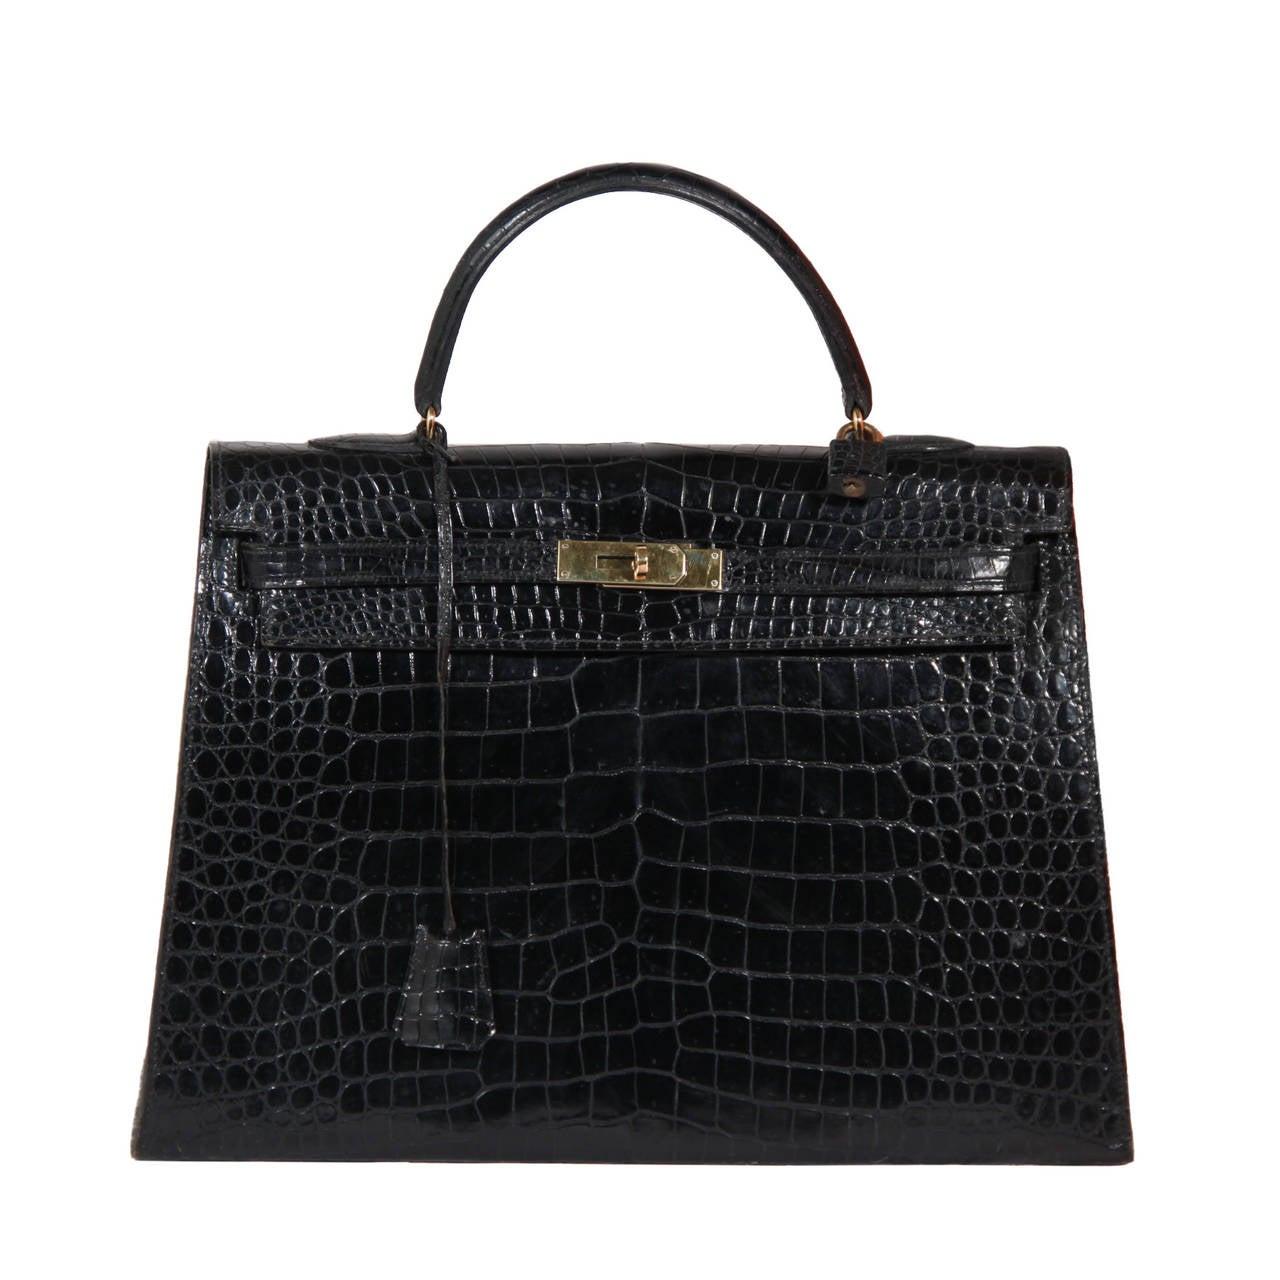 HERMES PARIS VINTAGE Black CROCODILE SKIN Leather KELLY BAG 35 ...